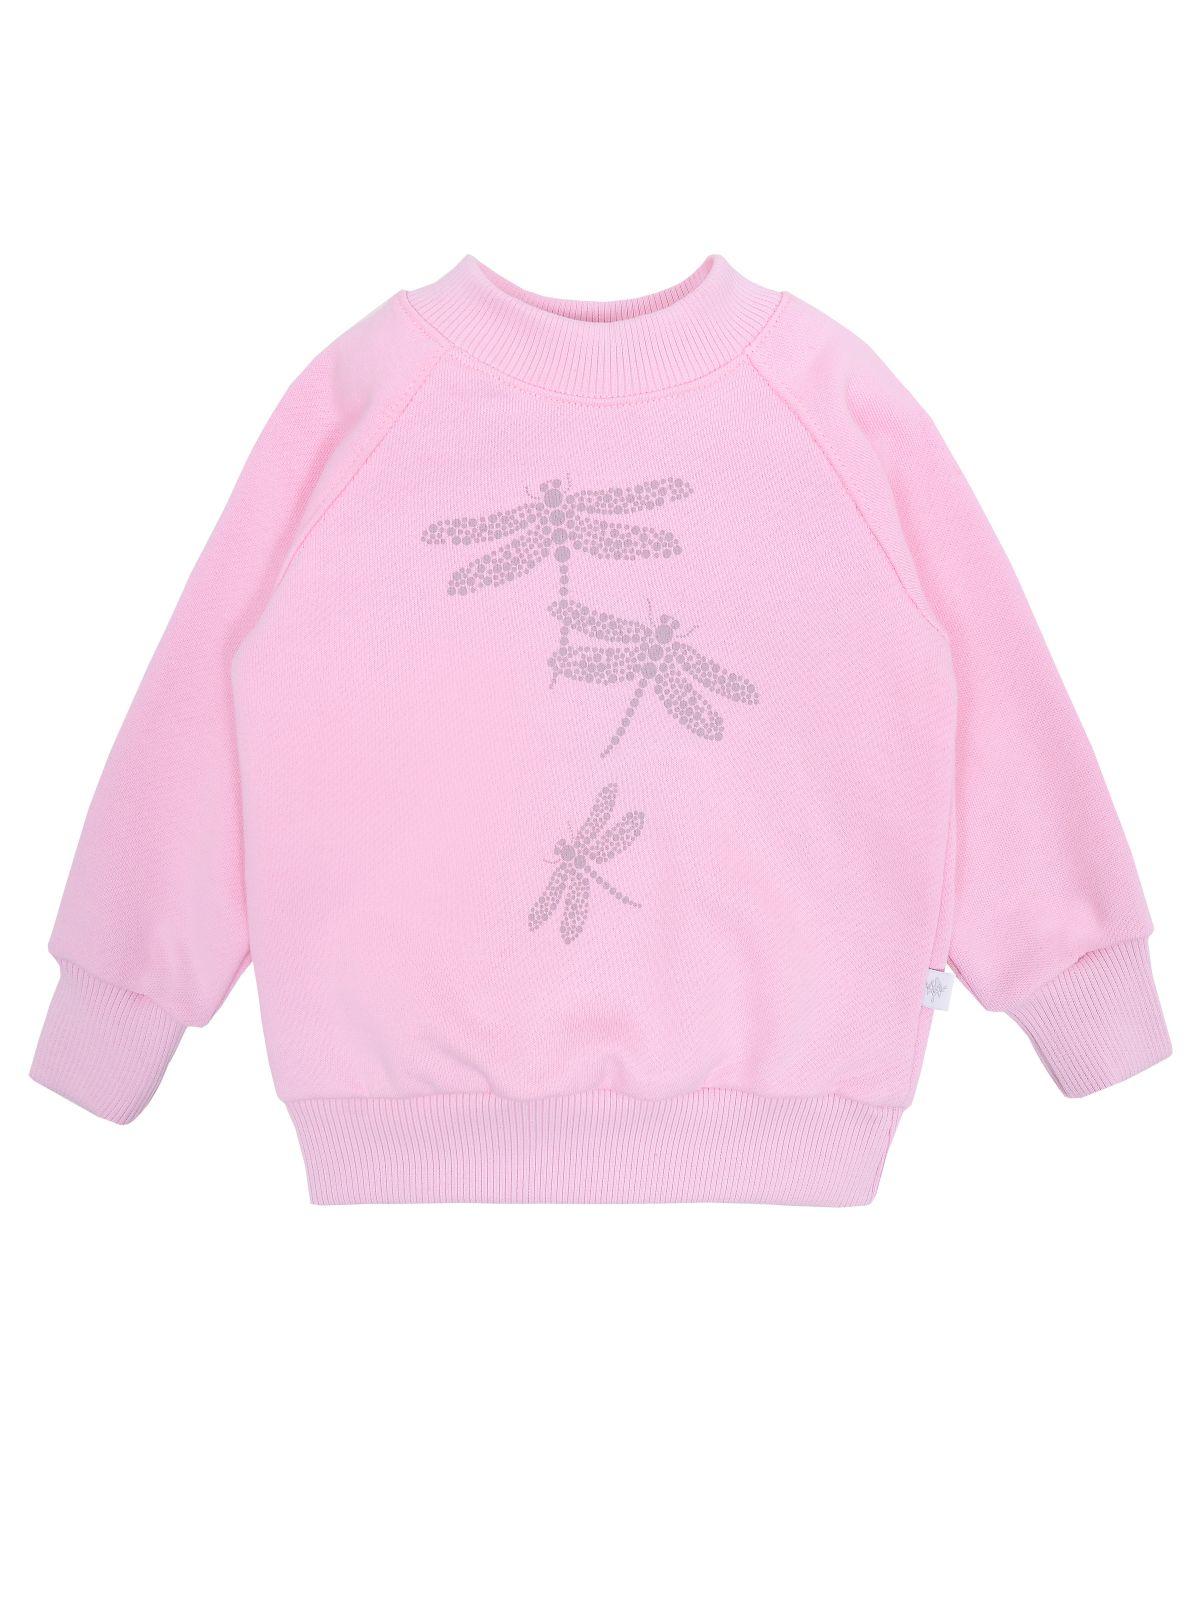 Джемпер для девочки Мамуляндия 19-837 Футер, Розовый р.104, 19-837